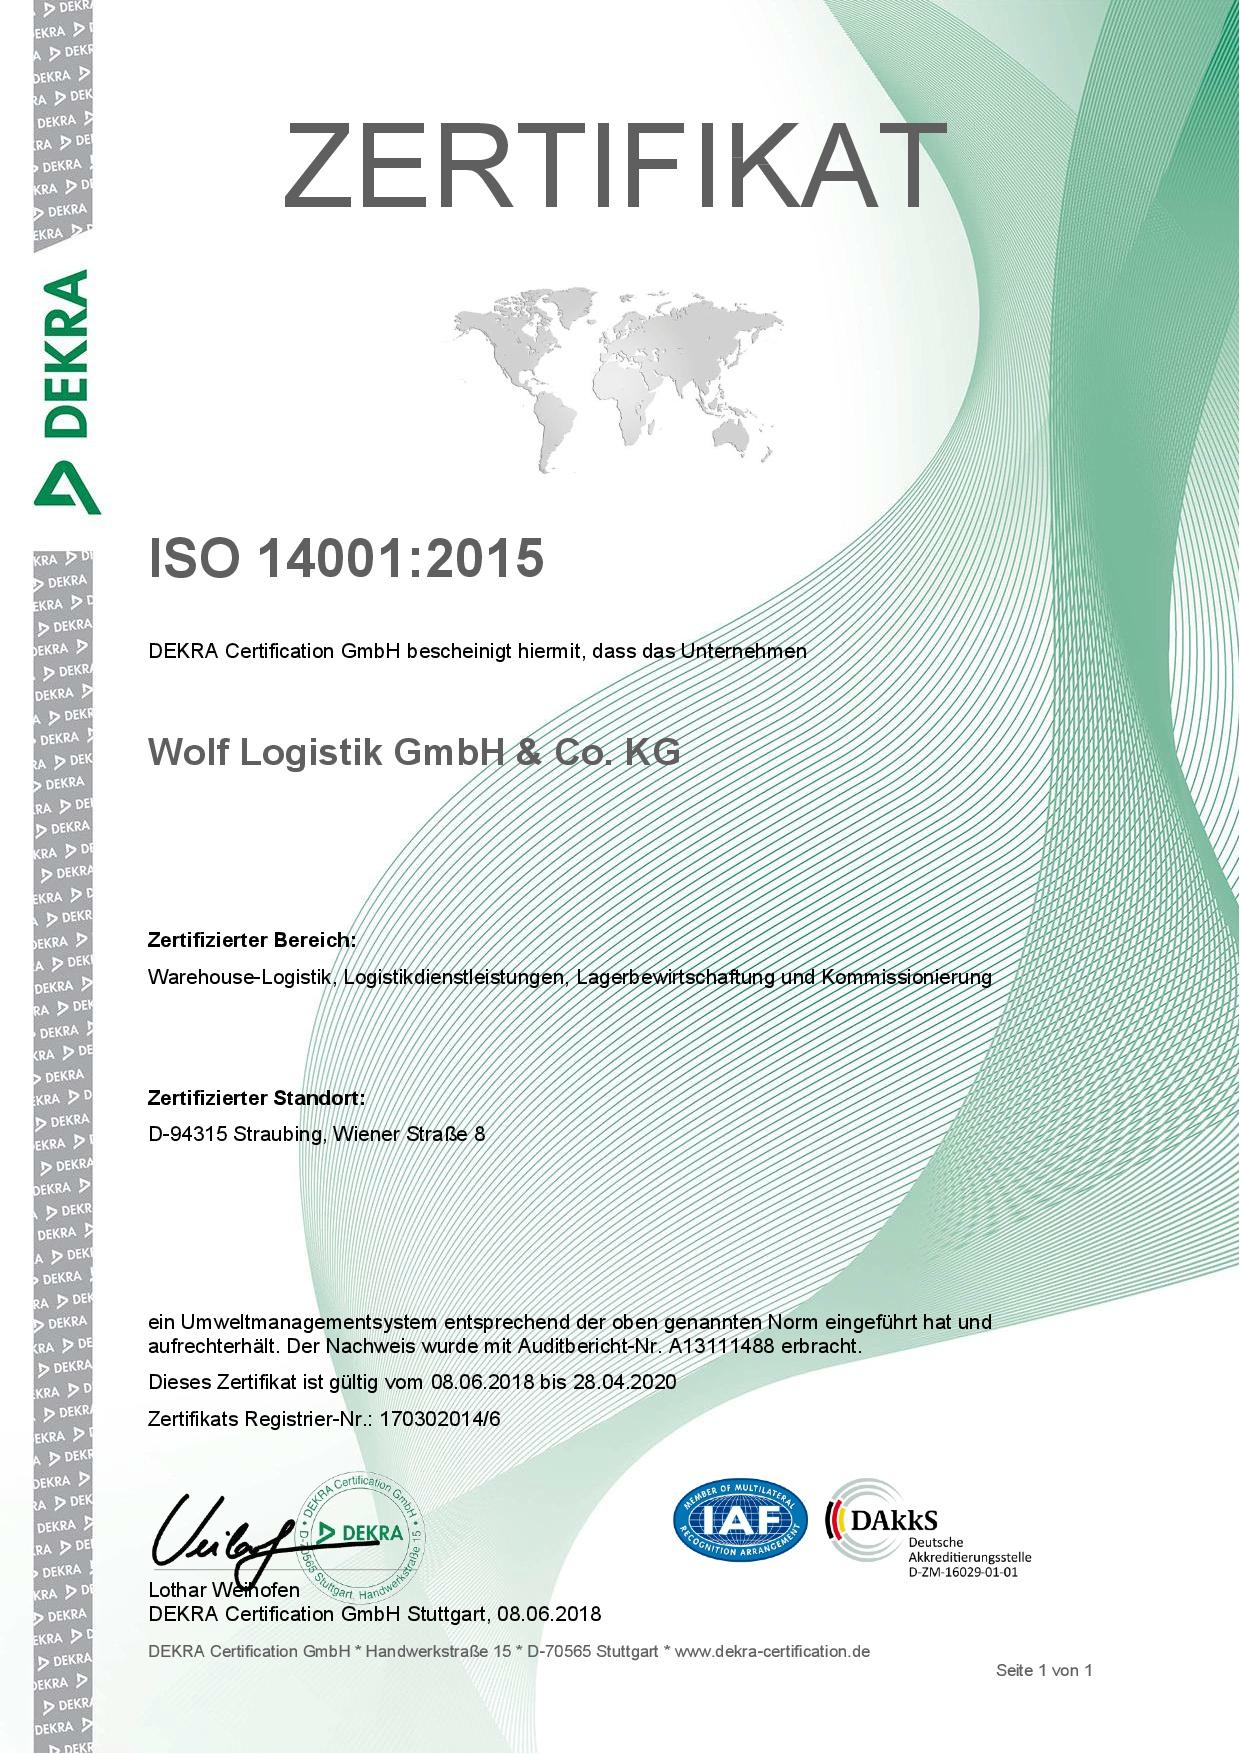 Rezert-Zertifikat-ISO-14001_2004